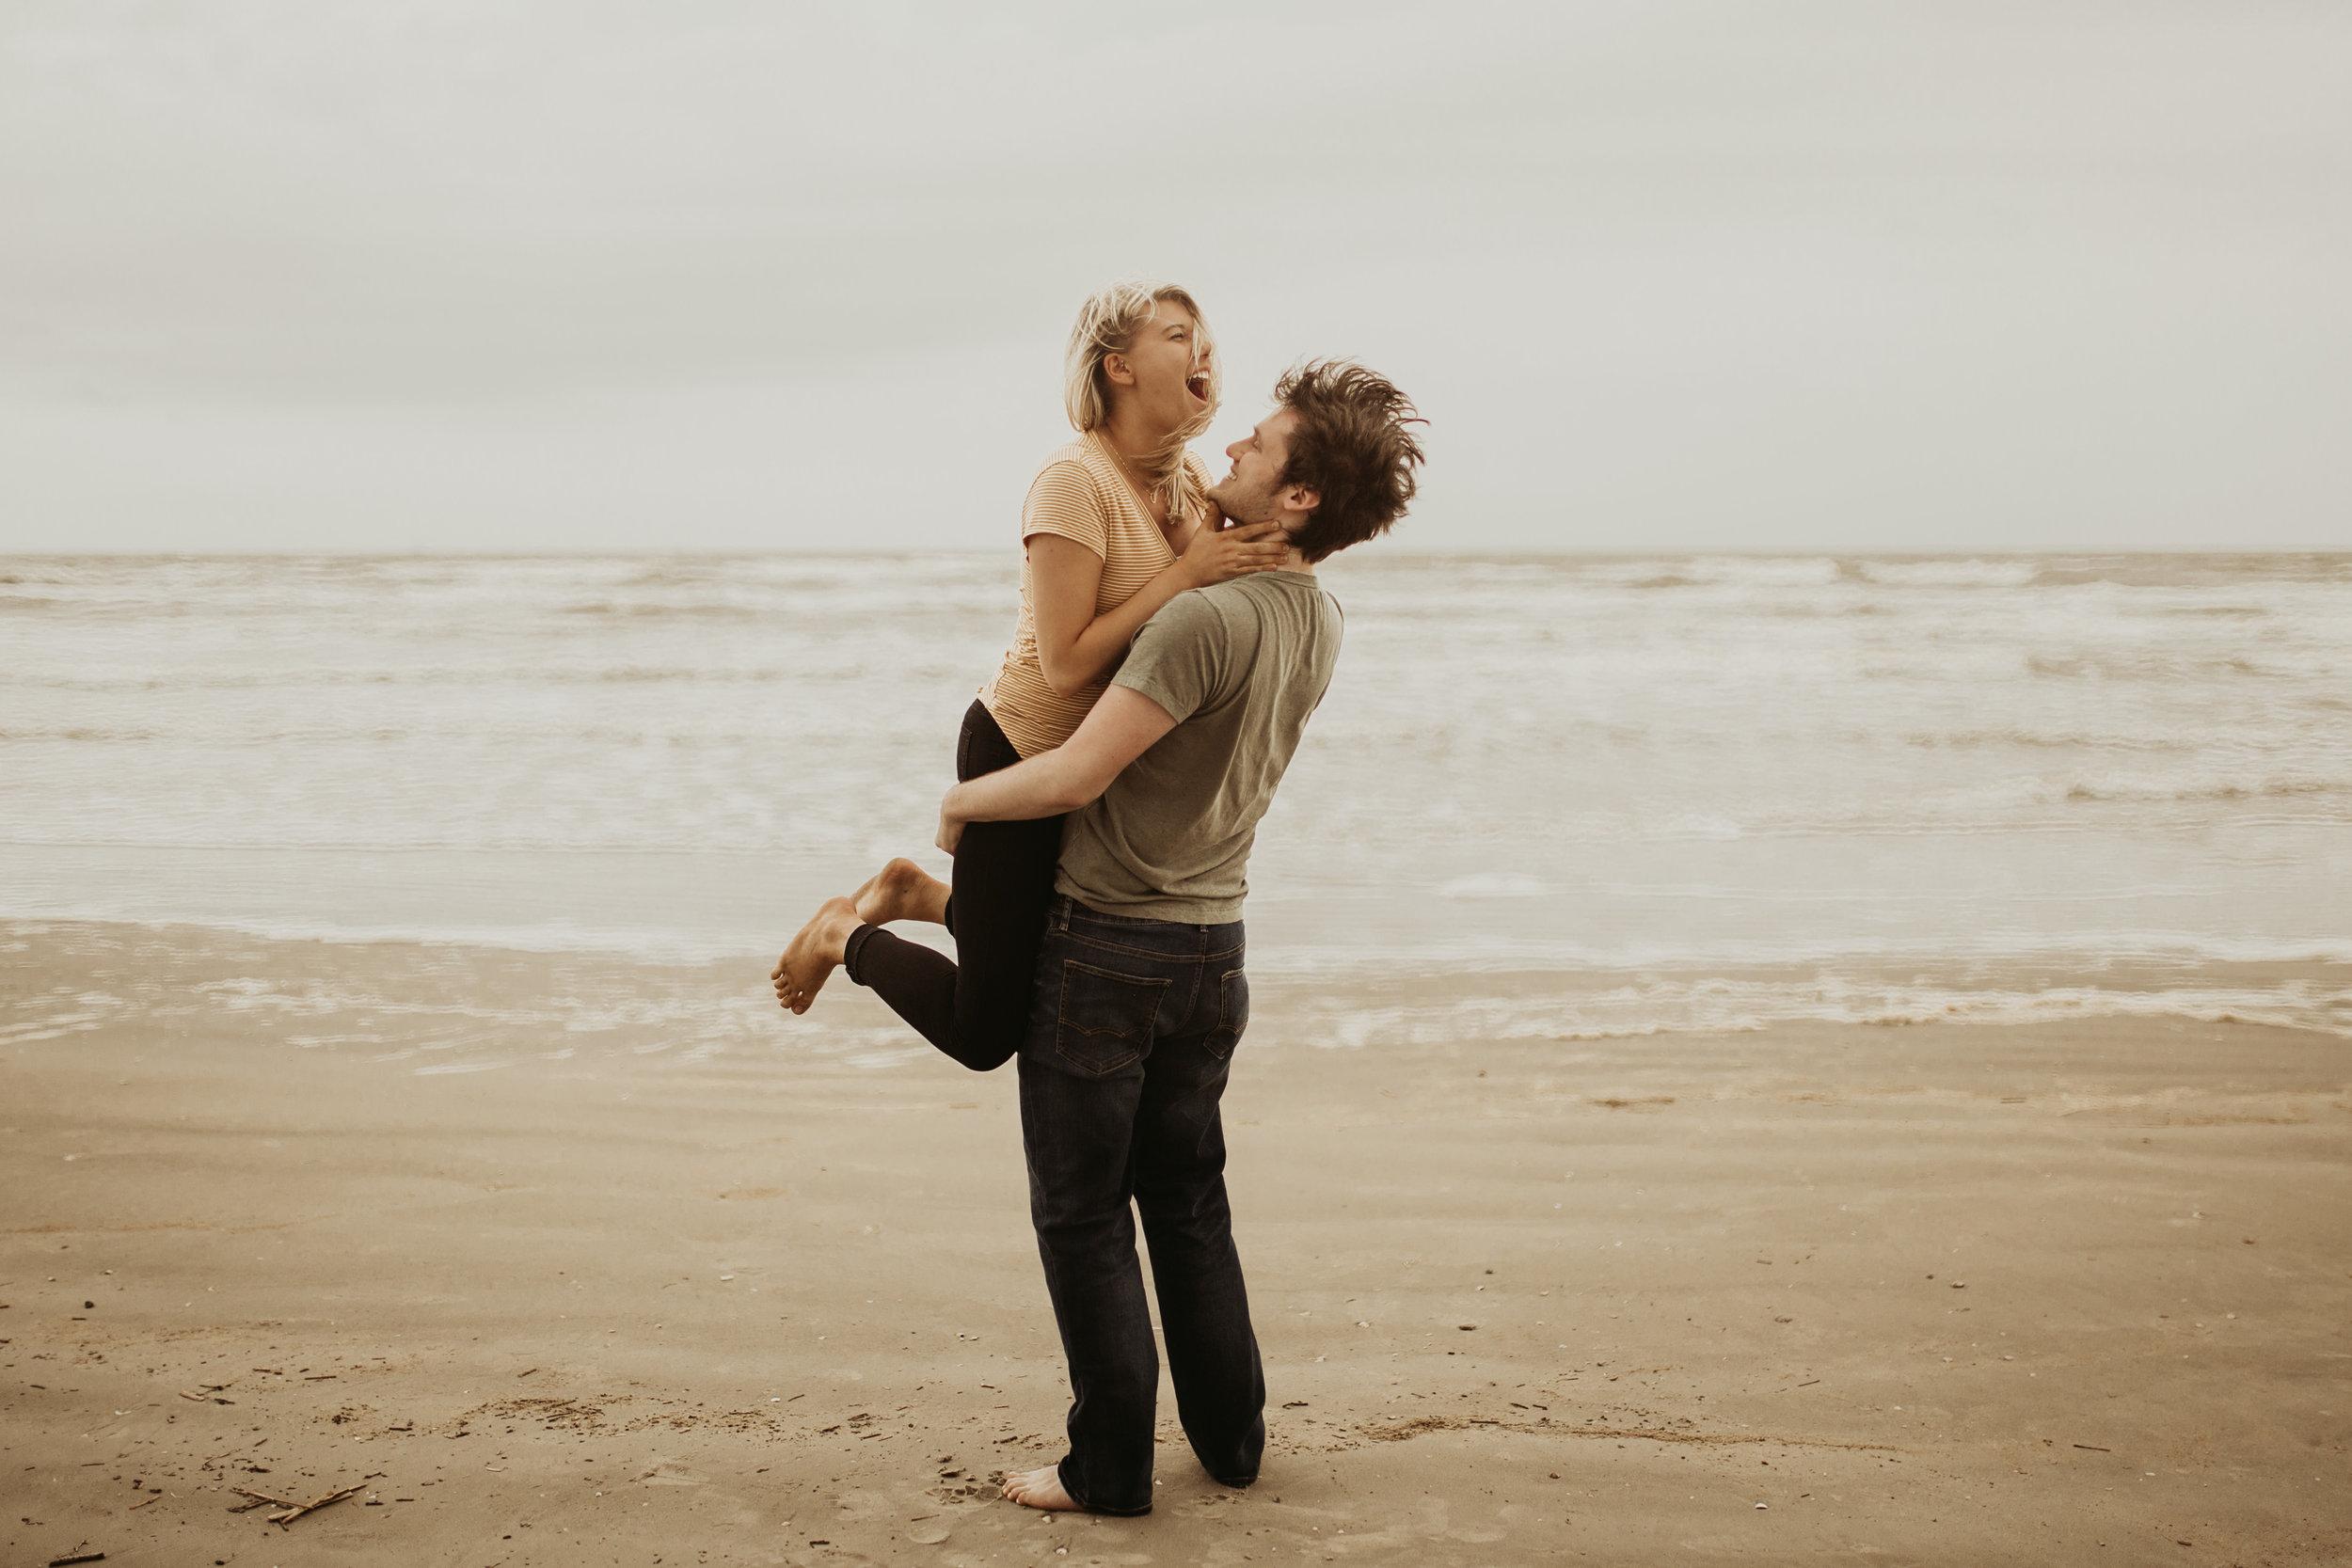 oceanside-california-hawaii-wedding-photographer04.jpg